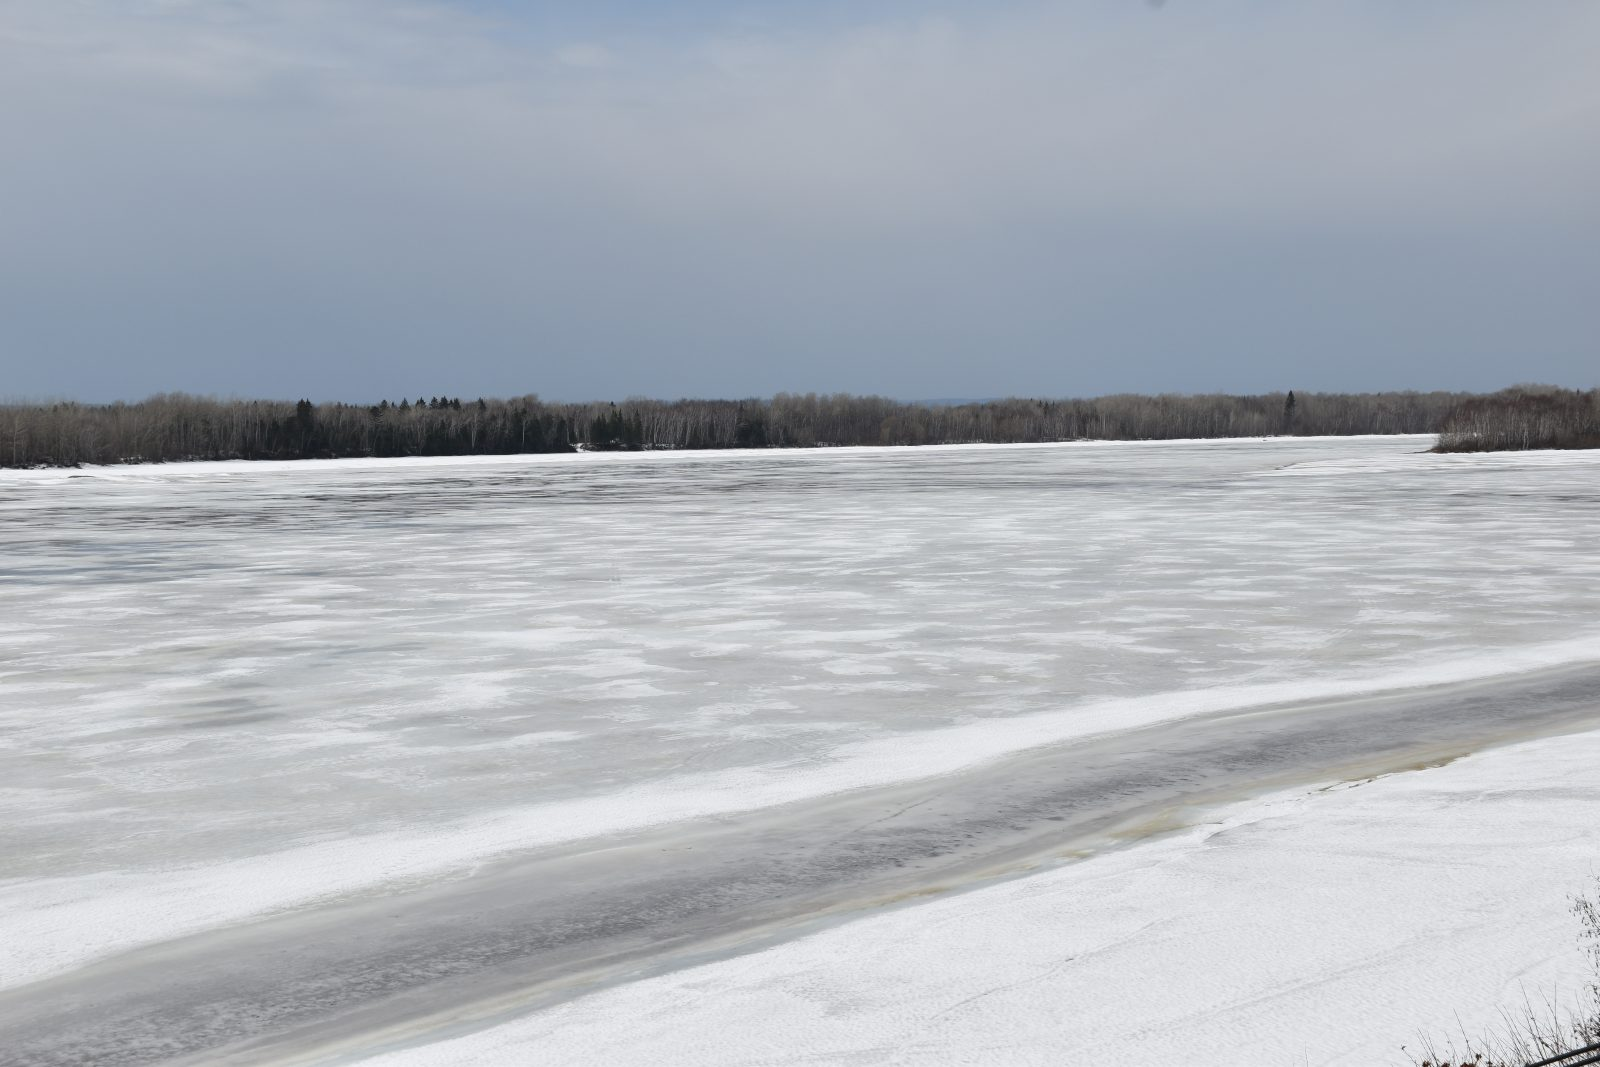 Lac Saint-Jean: crue hâtive ce printemps